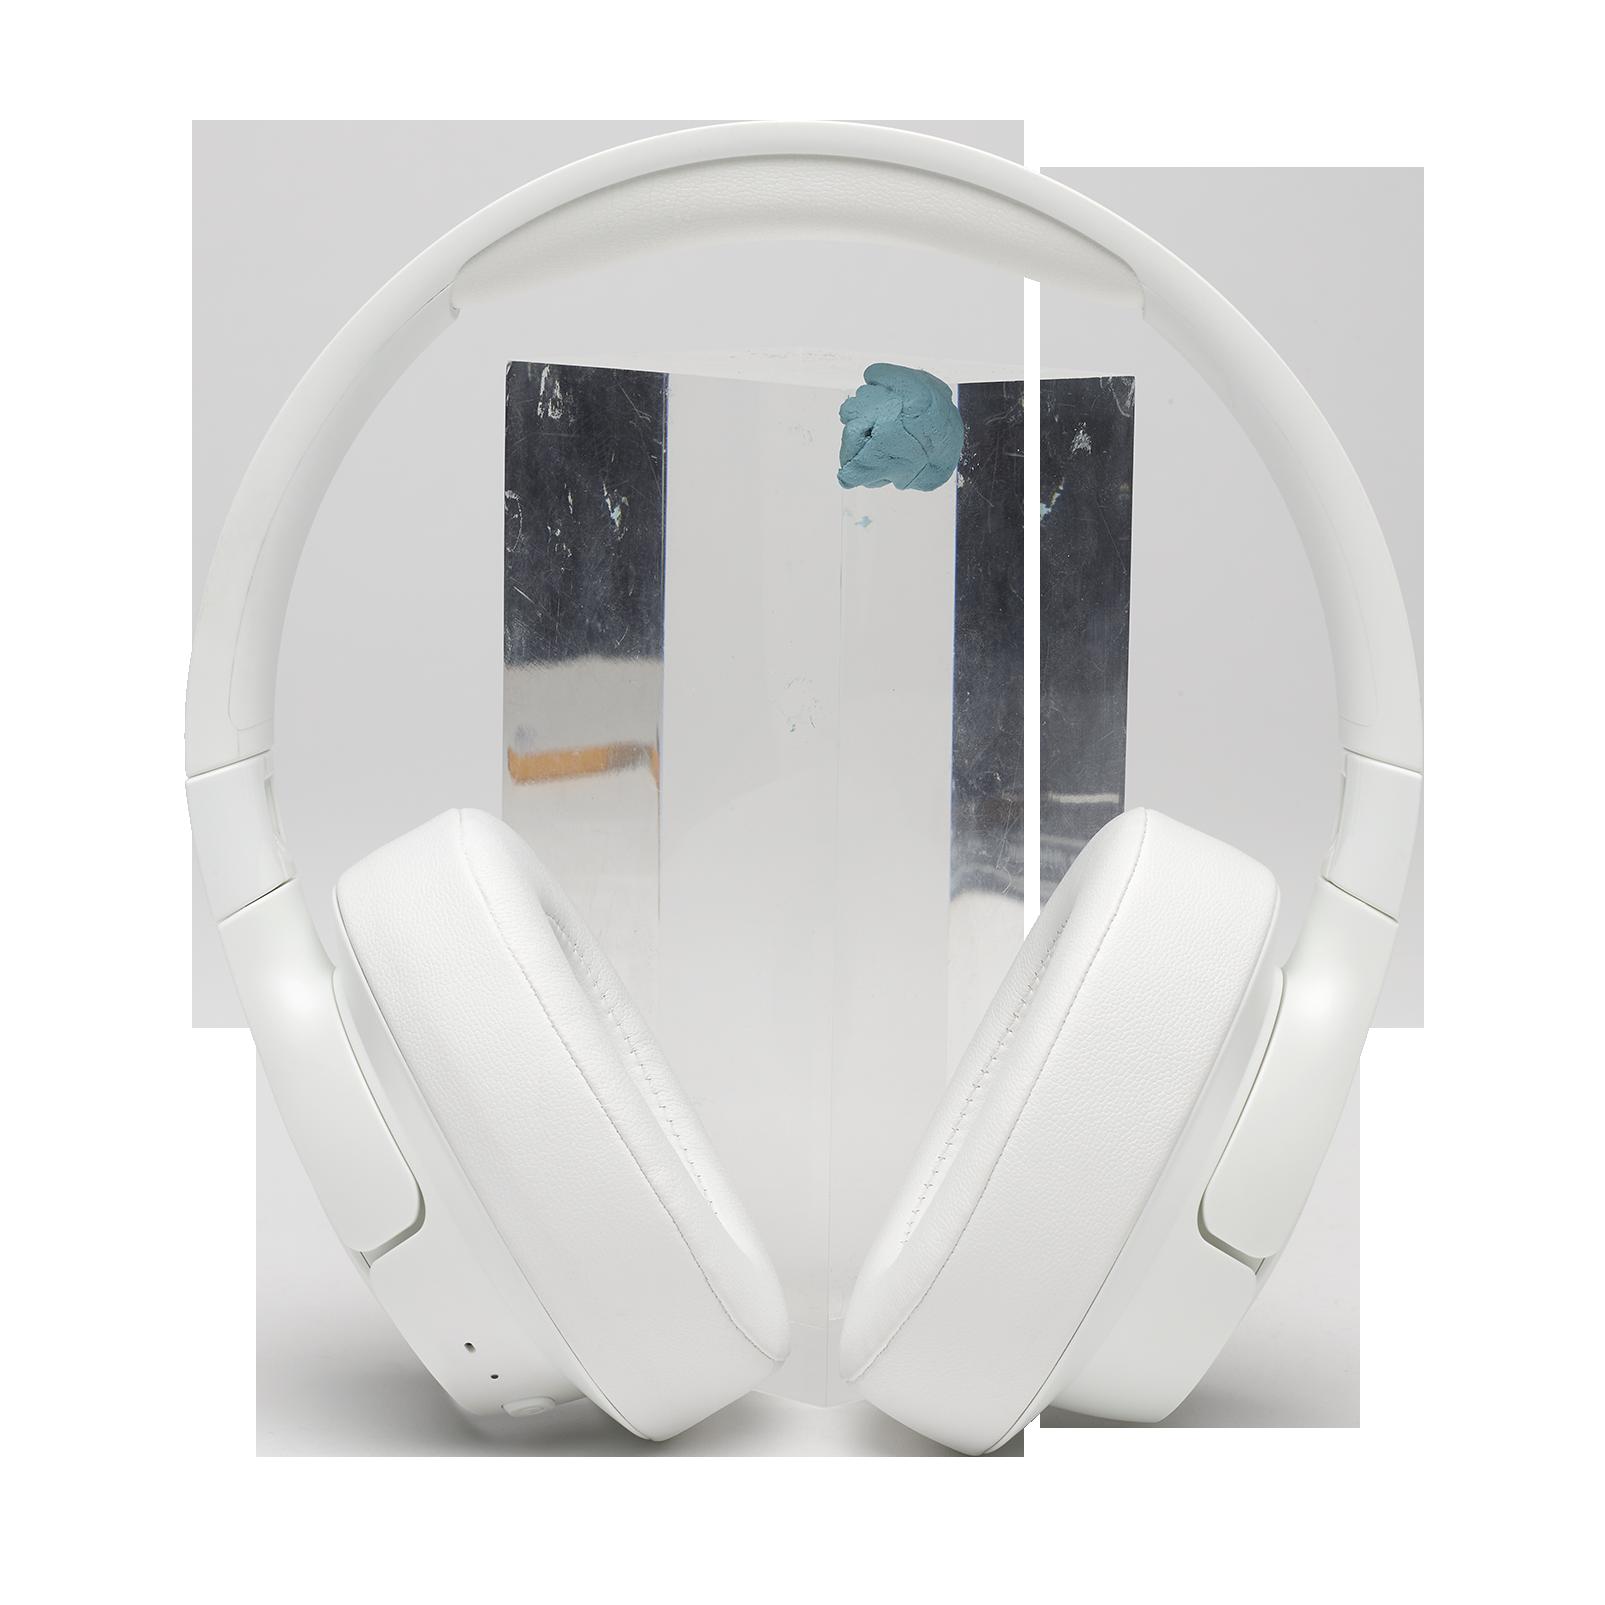 JBL TUNE 700BT - White - Wireless Over-Ear Headphones - Front